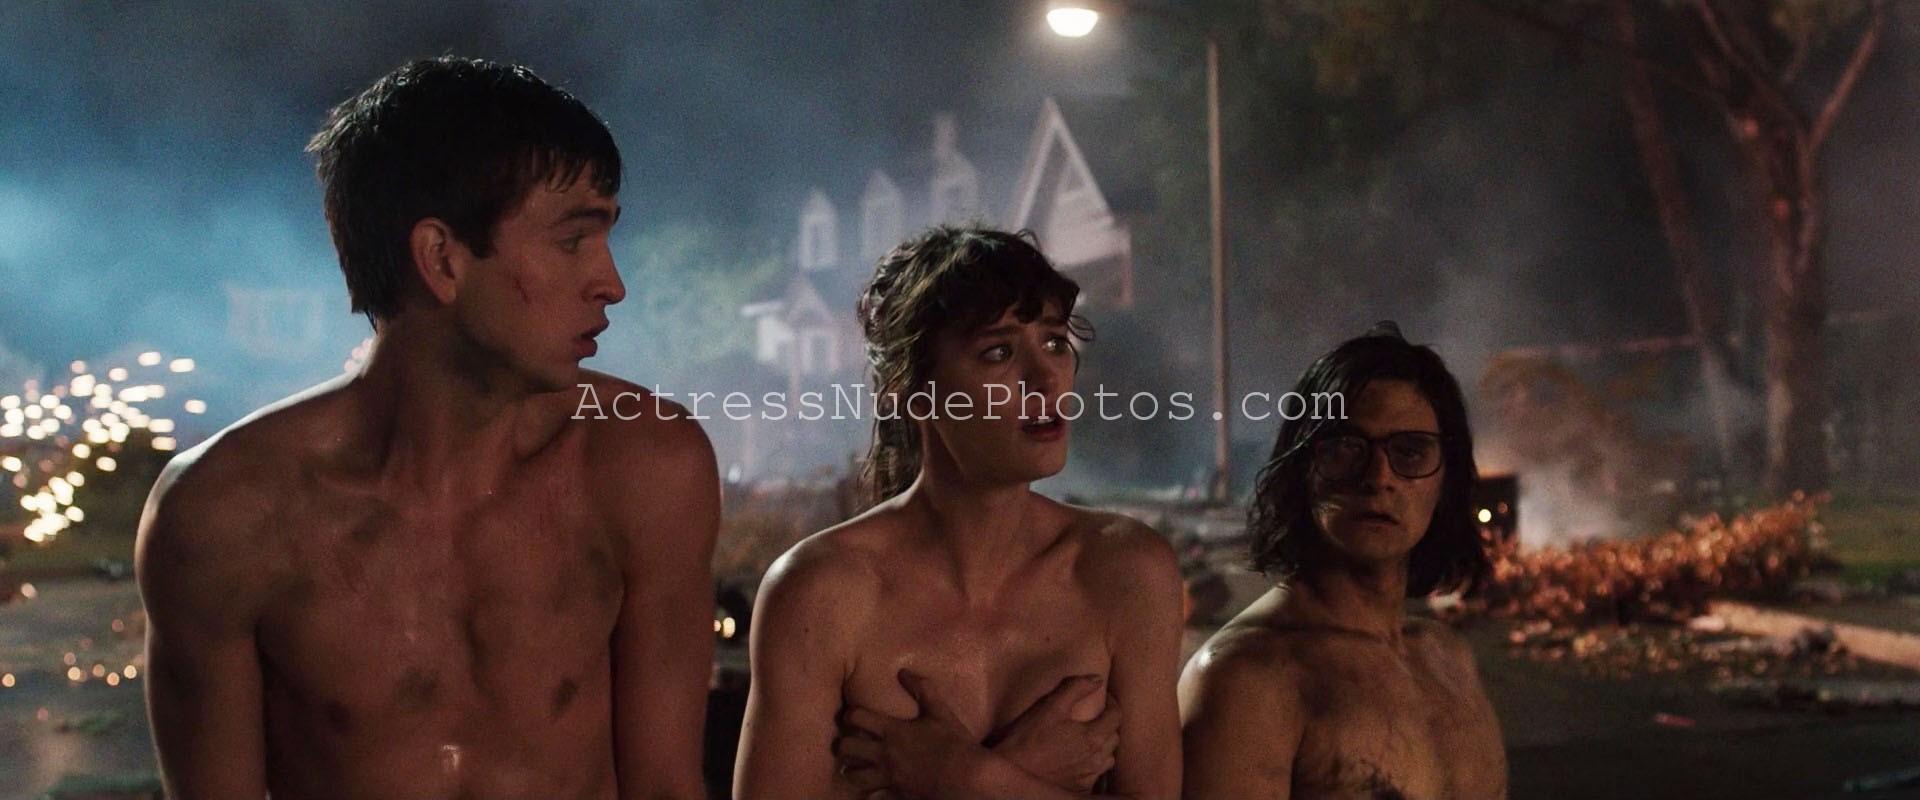 Naked mackenzie davis nude